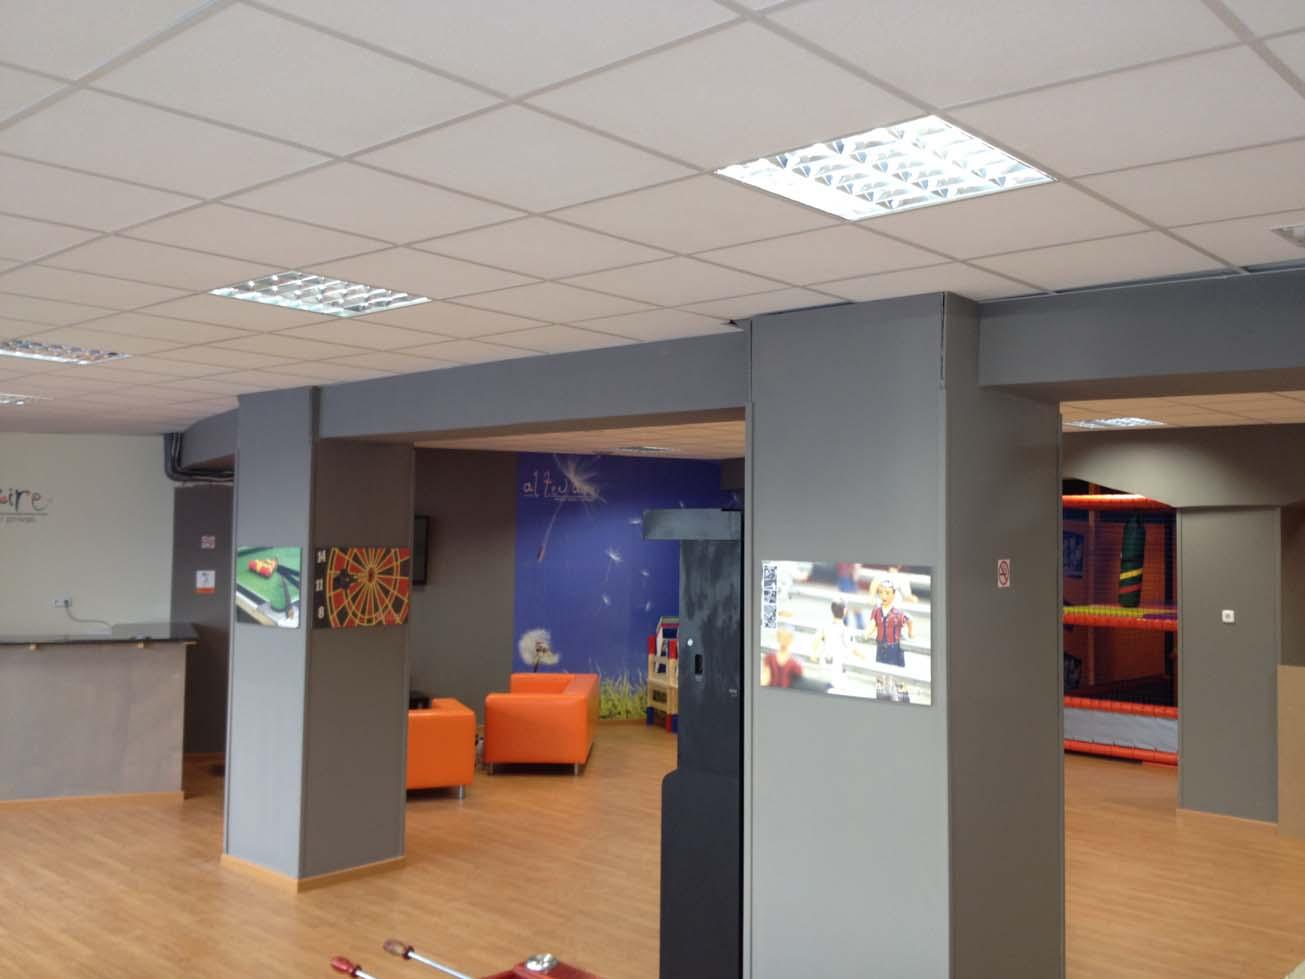 Alteuaire - Sala Francesc Moragas